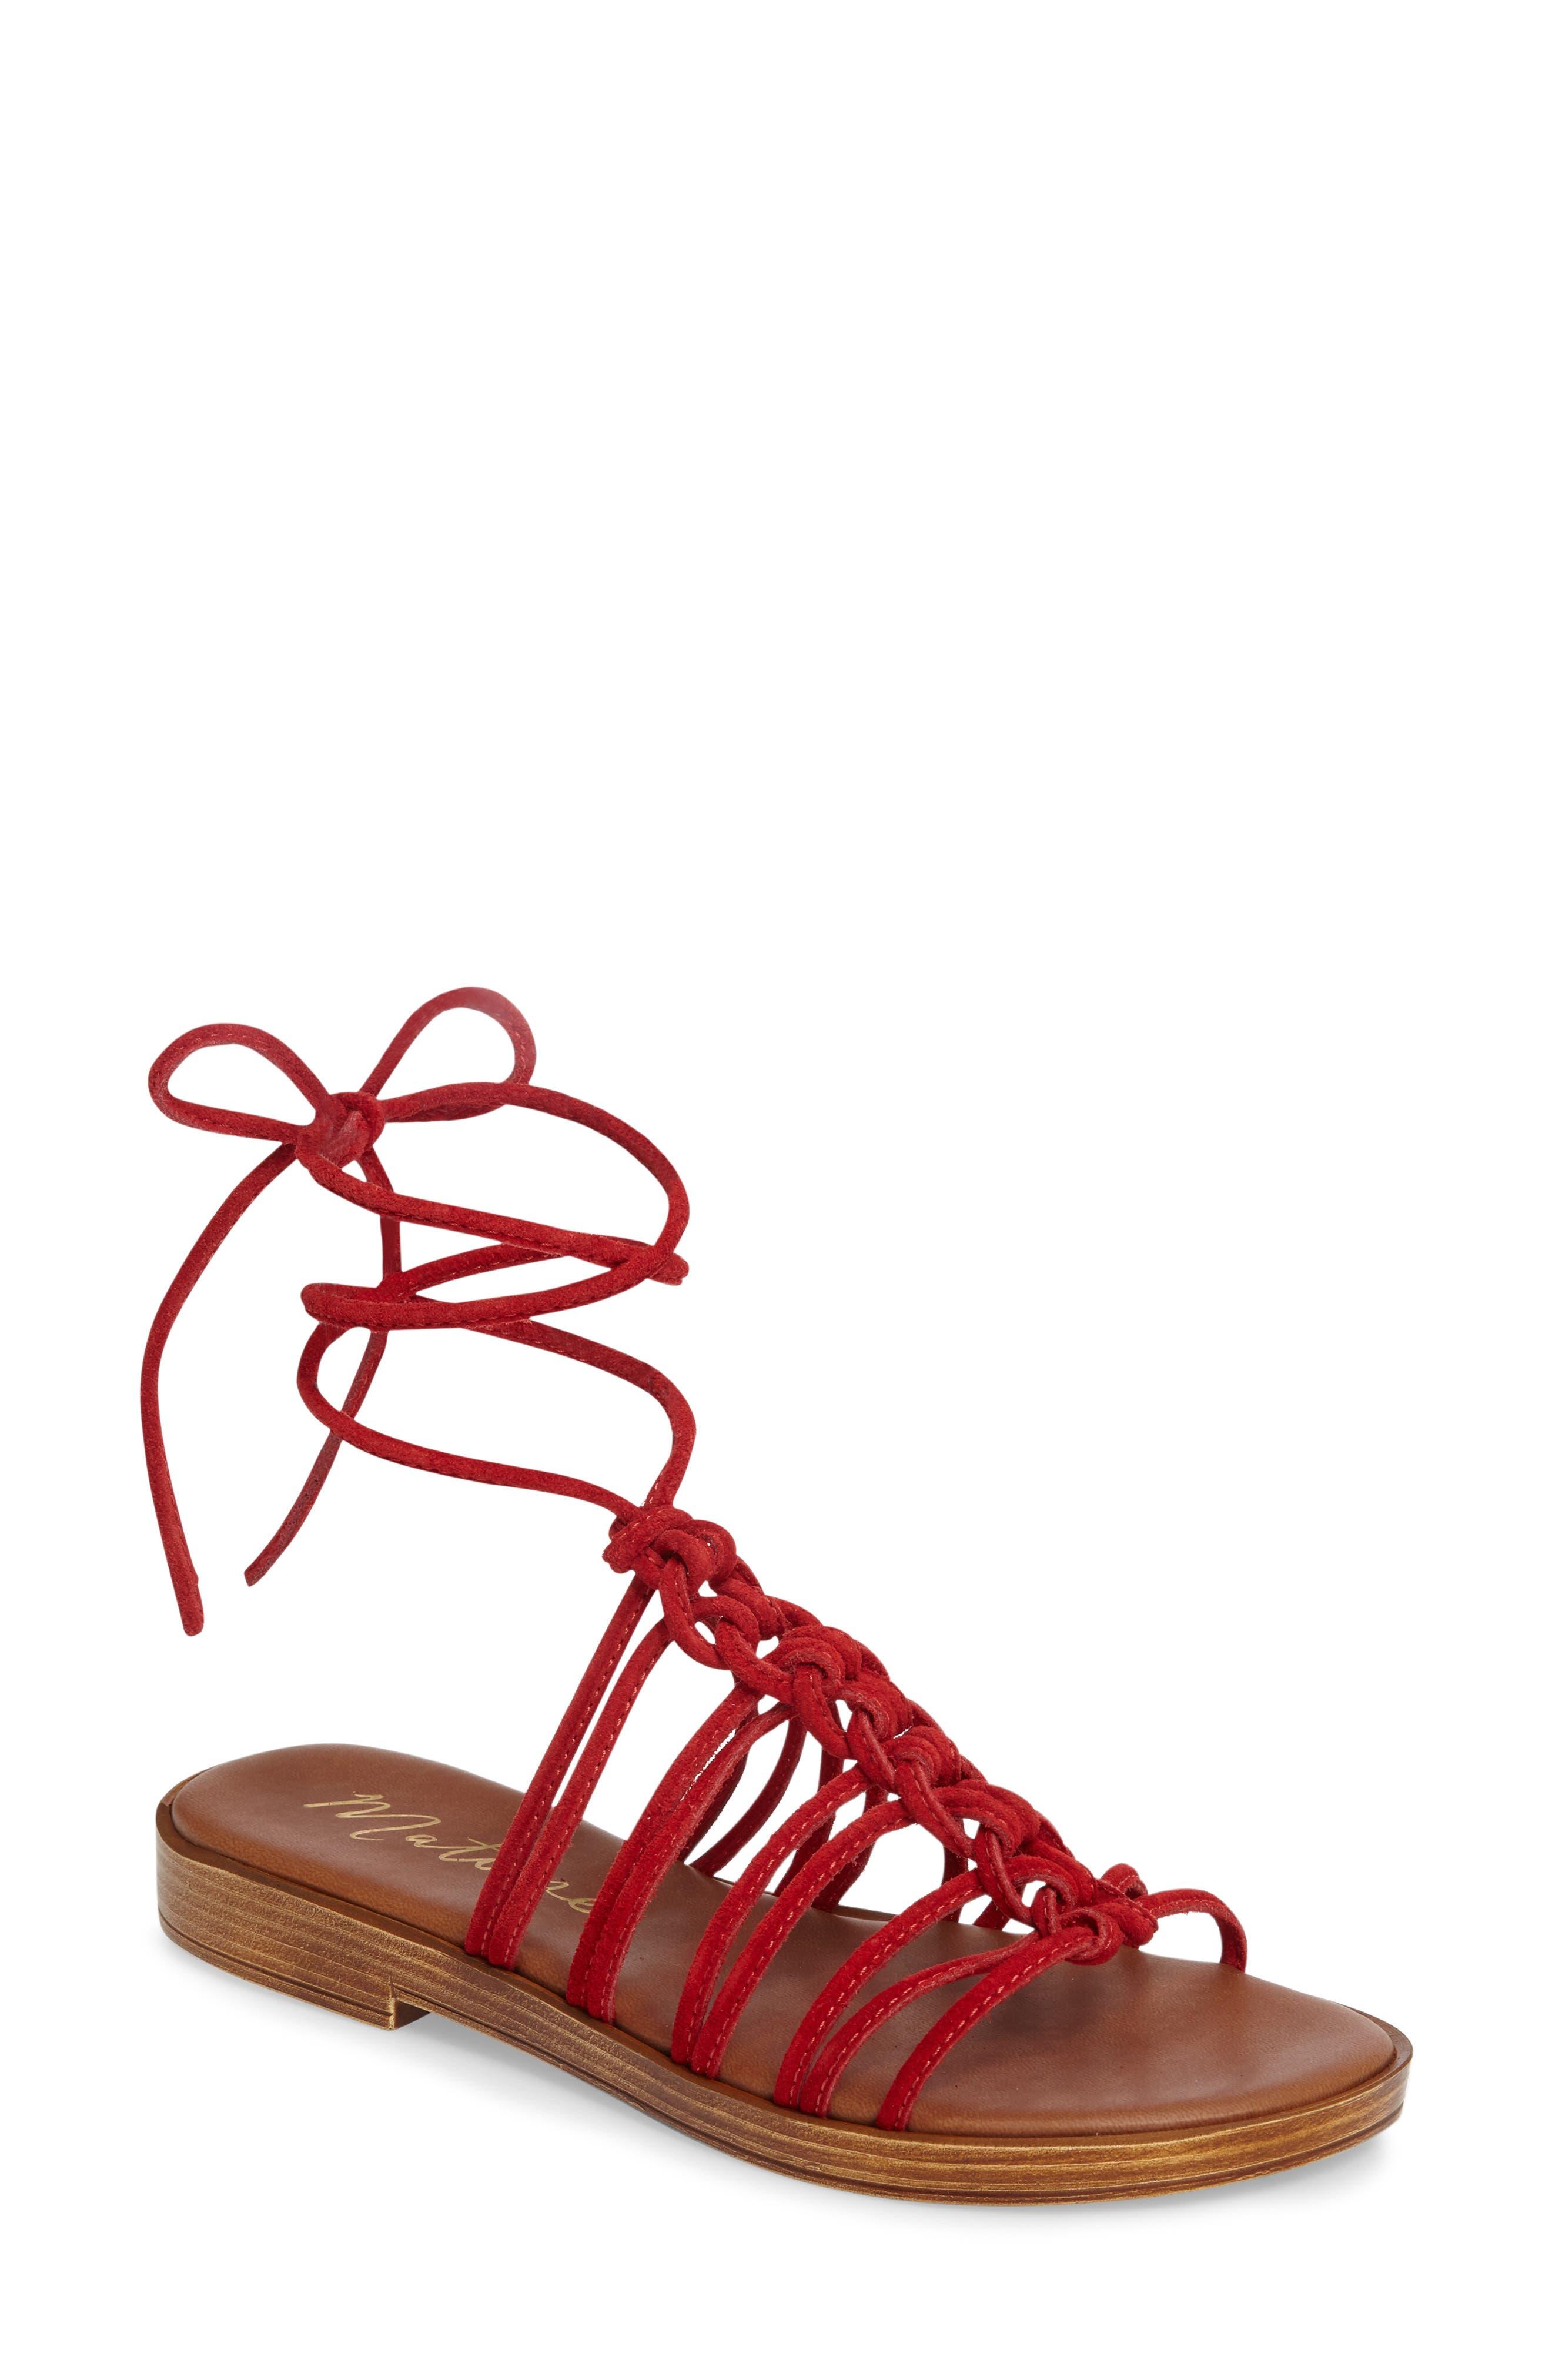 Origin Lace-Up Sandal,                         Main,                         color, Red Suede